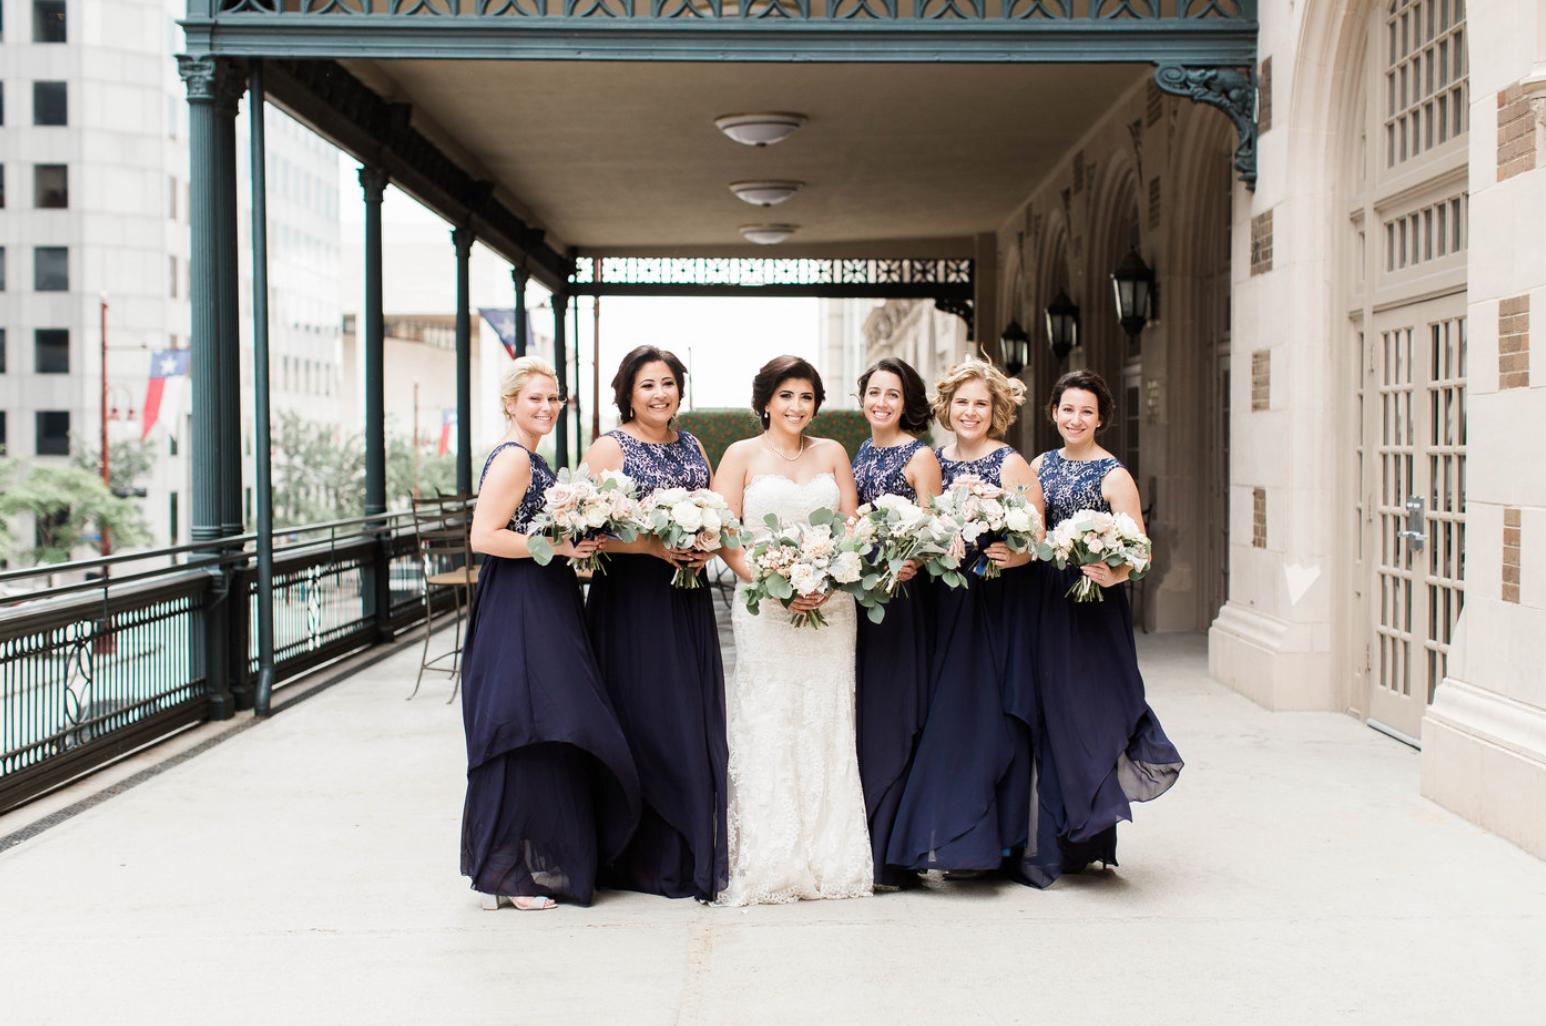 bride-bridesmaids-navy-dress-crystal-ballroom-airy-wedding-bouquet-by-maxit-flower-design-in-houston-texas